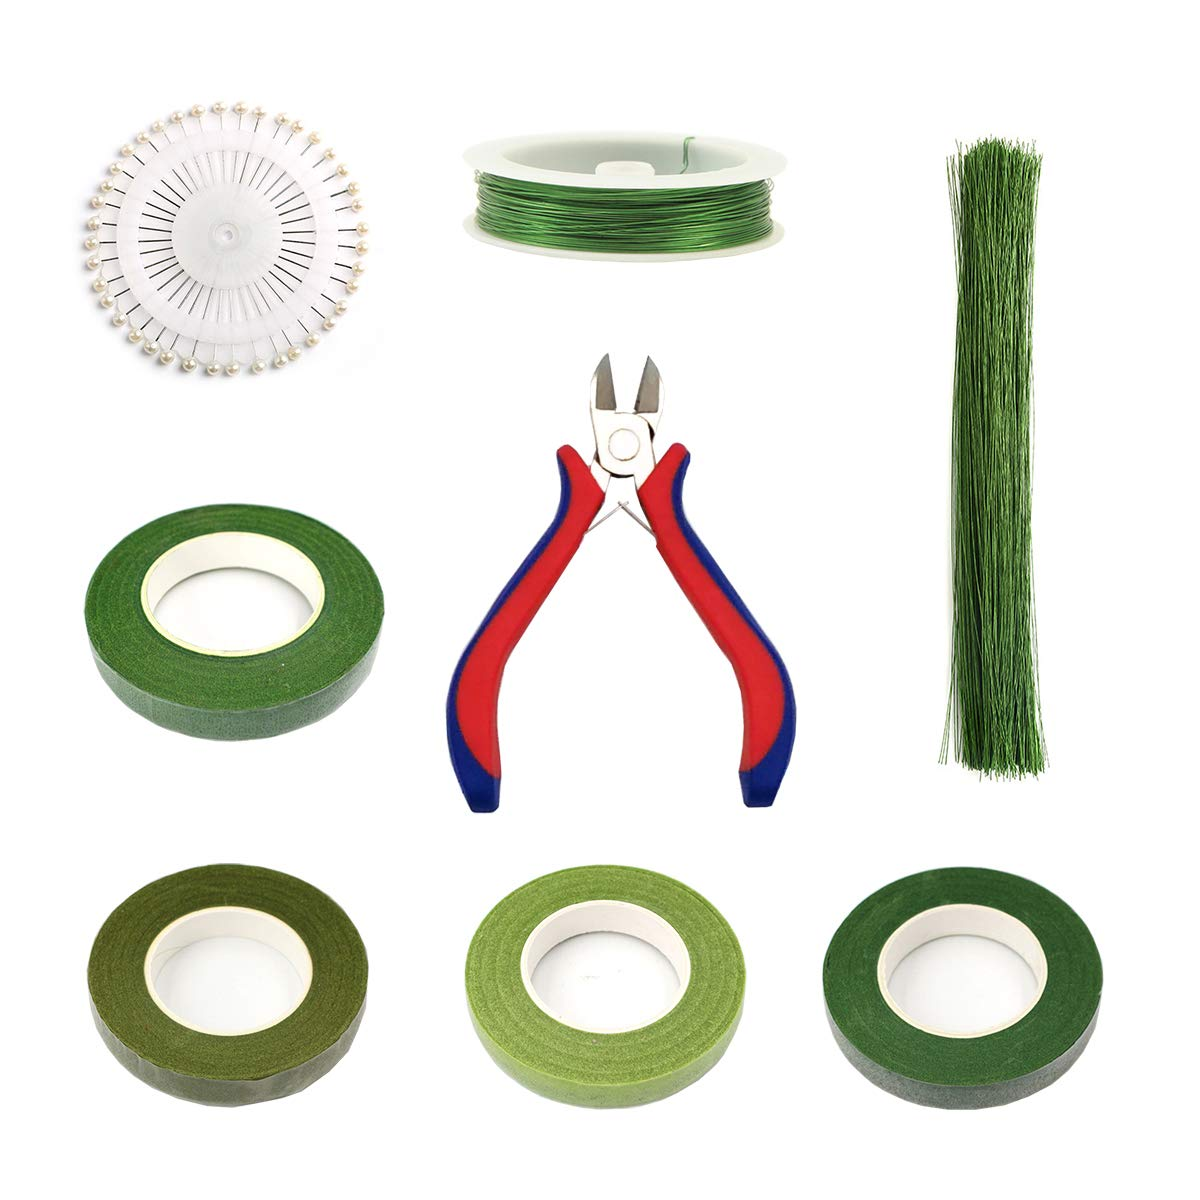 Floral Arrangement Kit Tools - Zivisk 8 Pcs Floral Supplies - Tools Wire Cutter, 4 Rolls Different Green Floral Tape, 100Pcs 22Gauge Floral Stem Wire, 0.4MM Floral Stem Wire, 40 Pcs Ball Head Pins